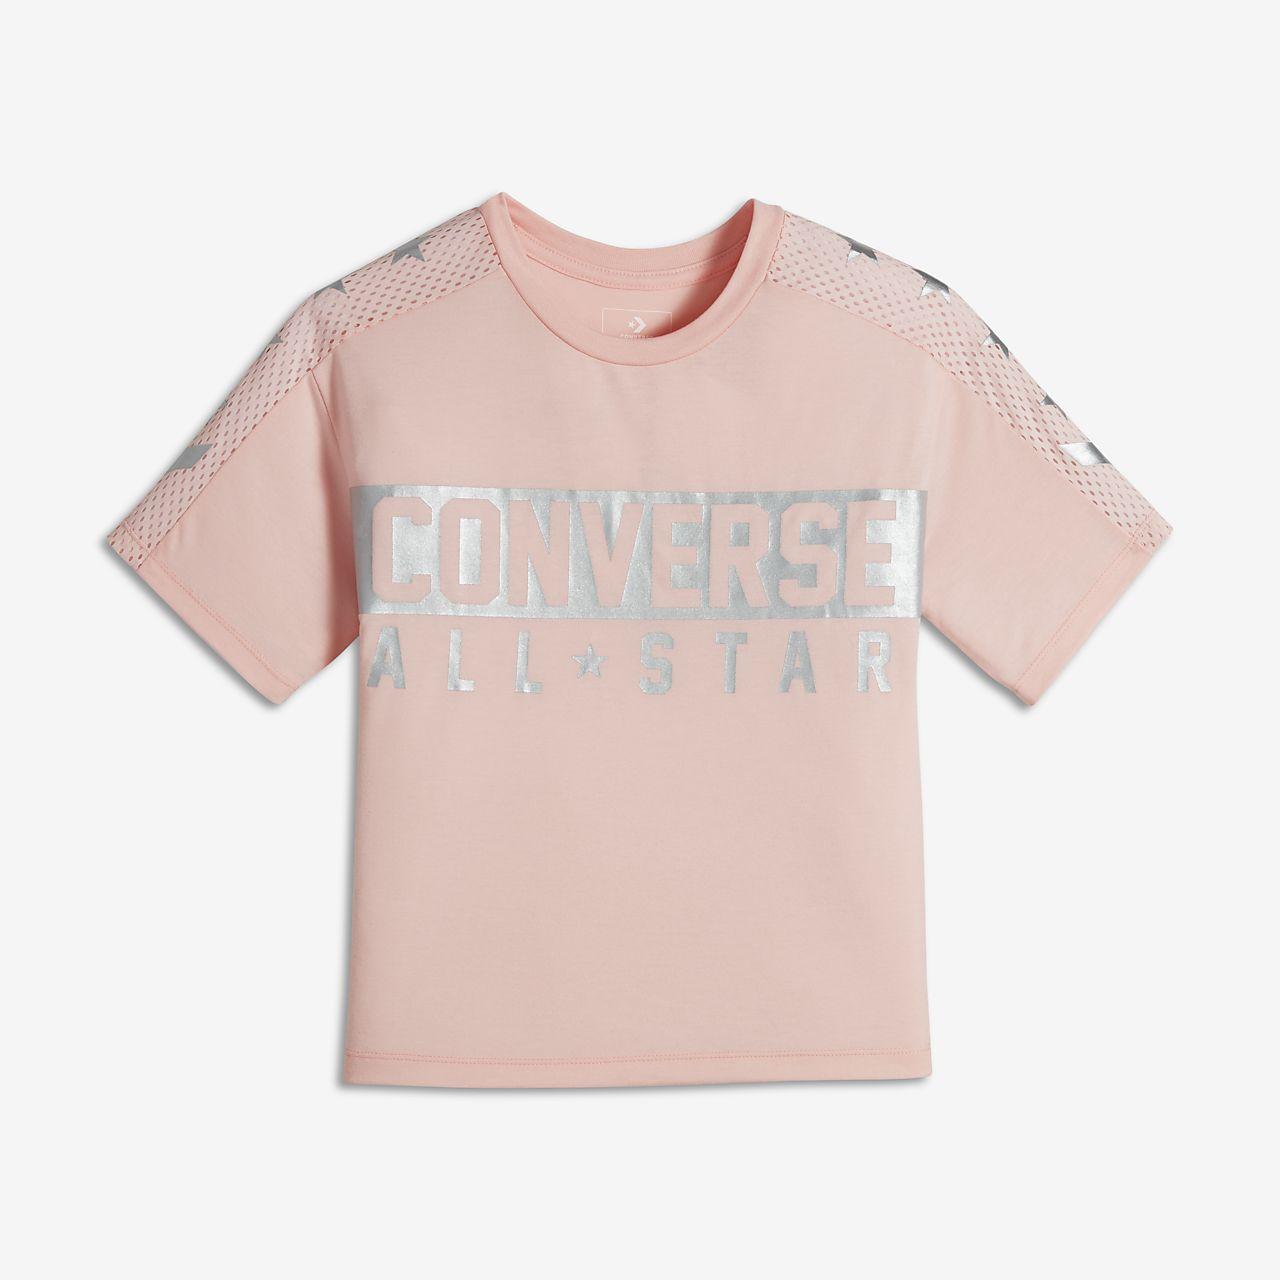 Converse Boxy Big Kids' (Girls') Knit Graphic Top